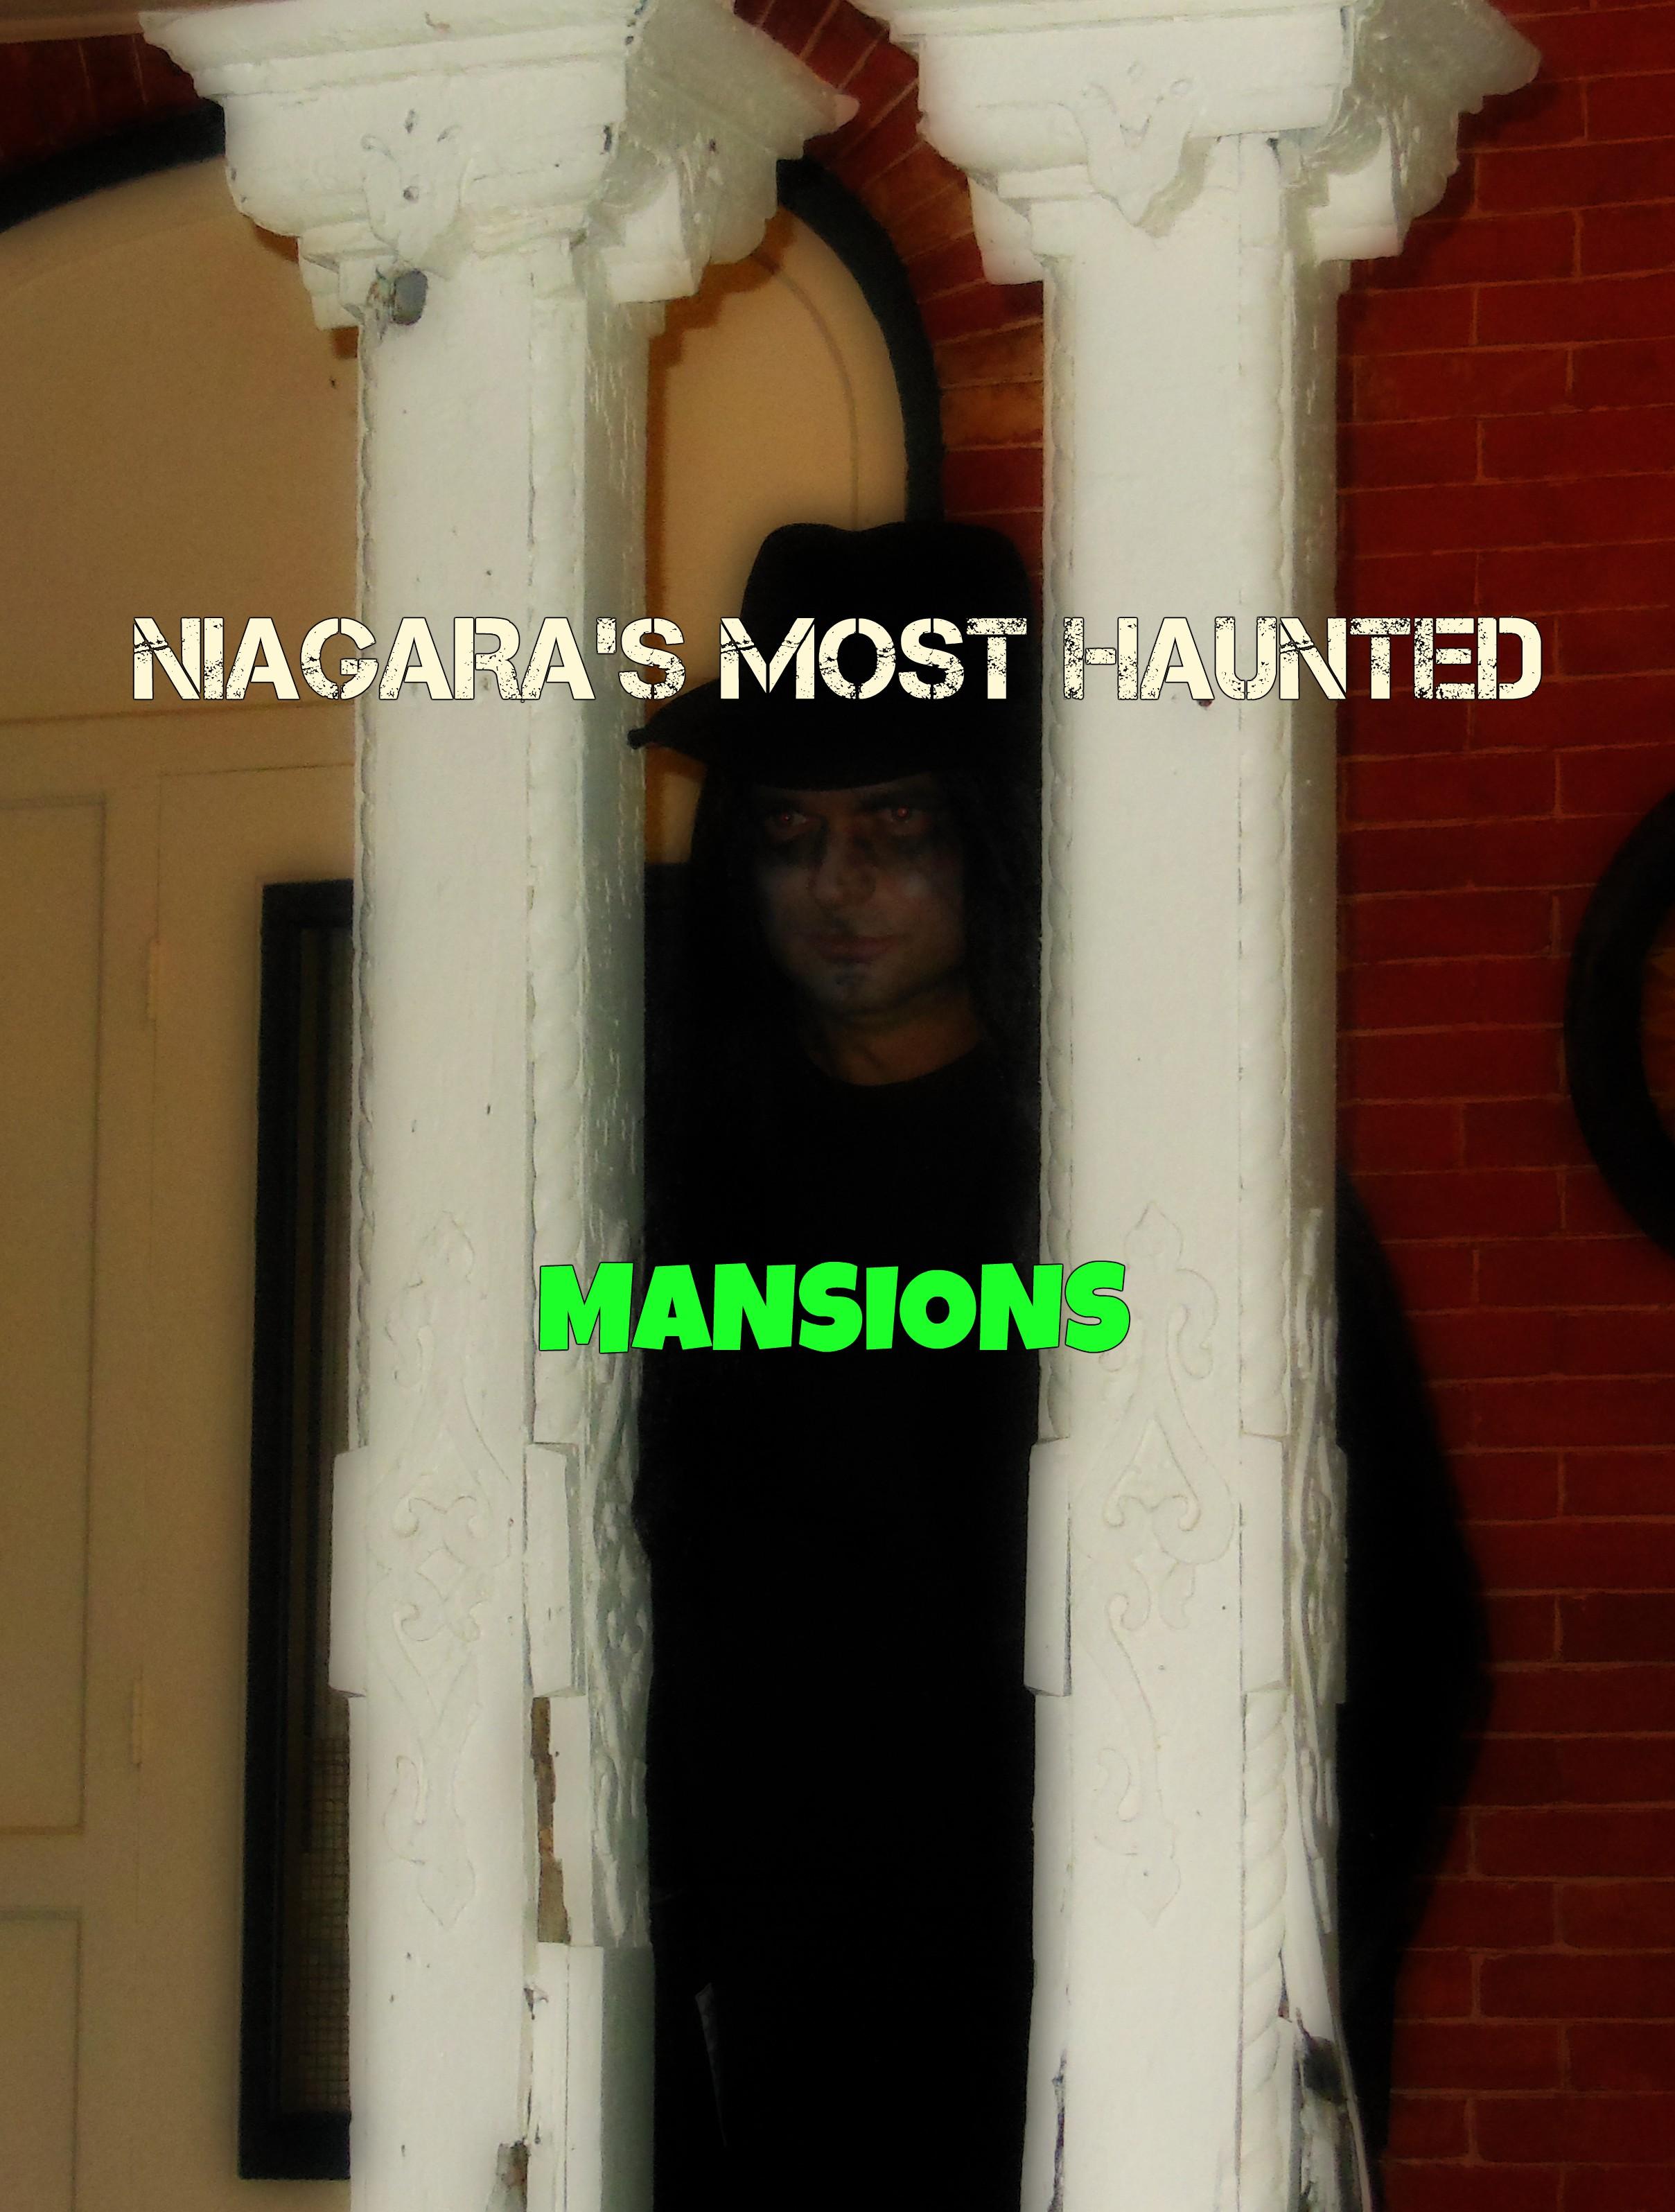 Niagaras Most Haunted